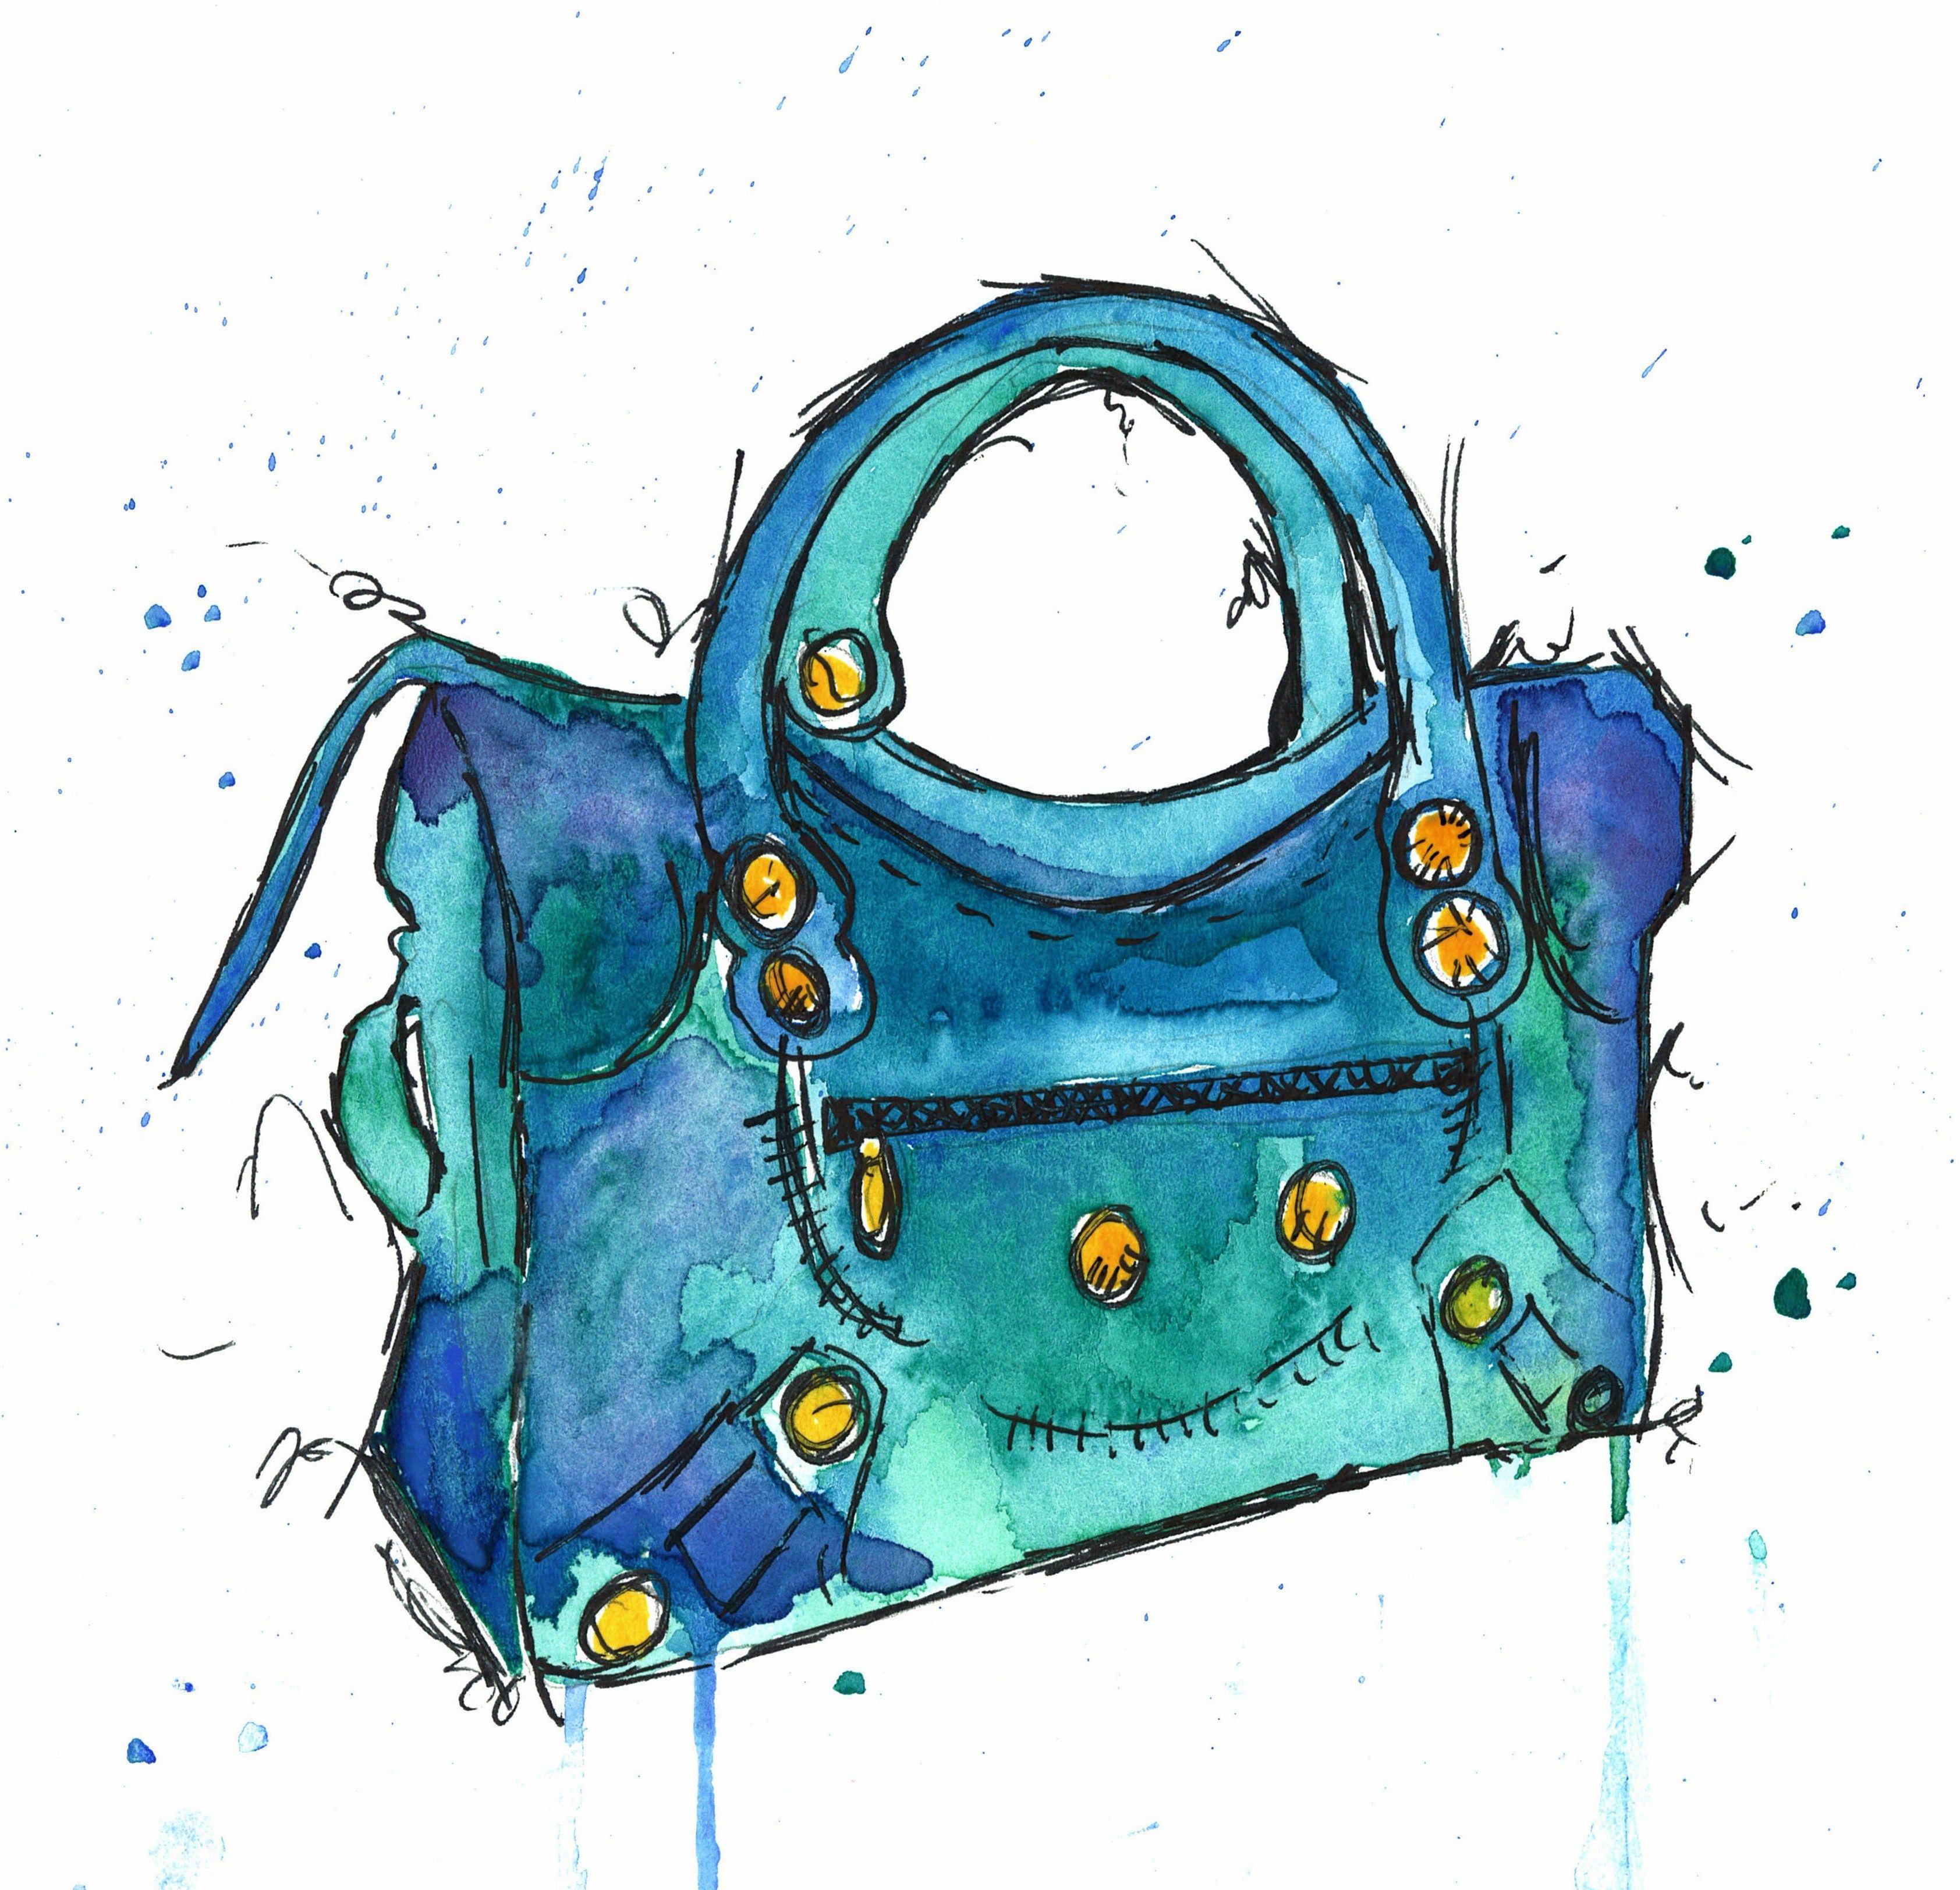 i painted this #balenciaga moto bag, love the teal and ...  watercolor purse diagram #10